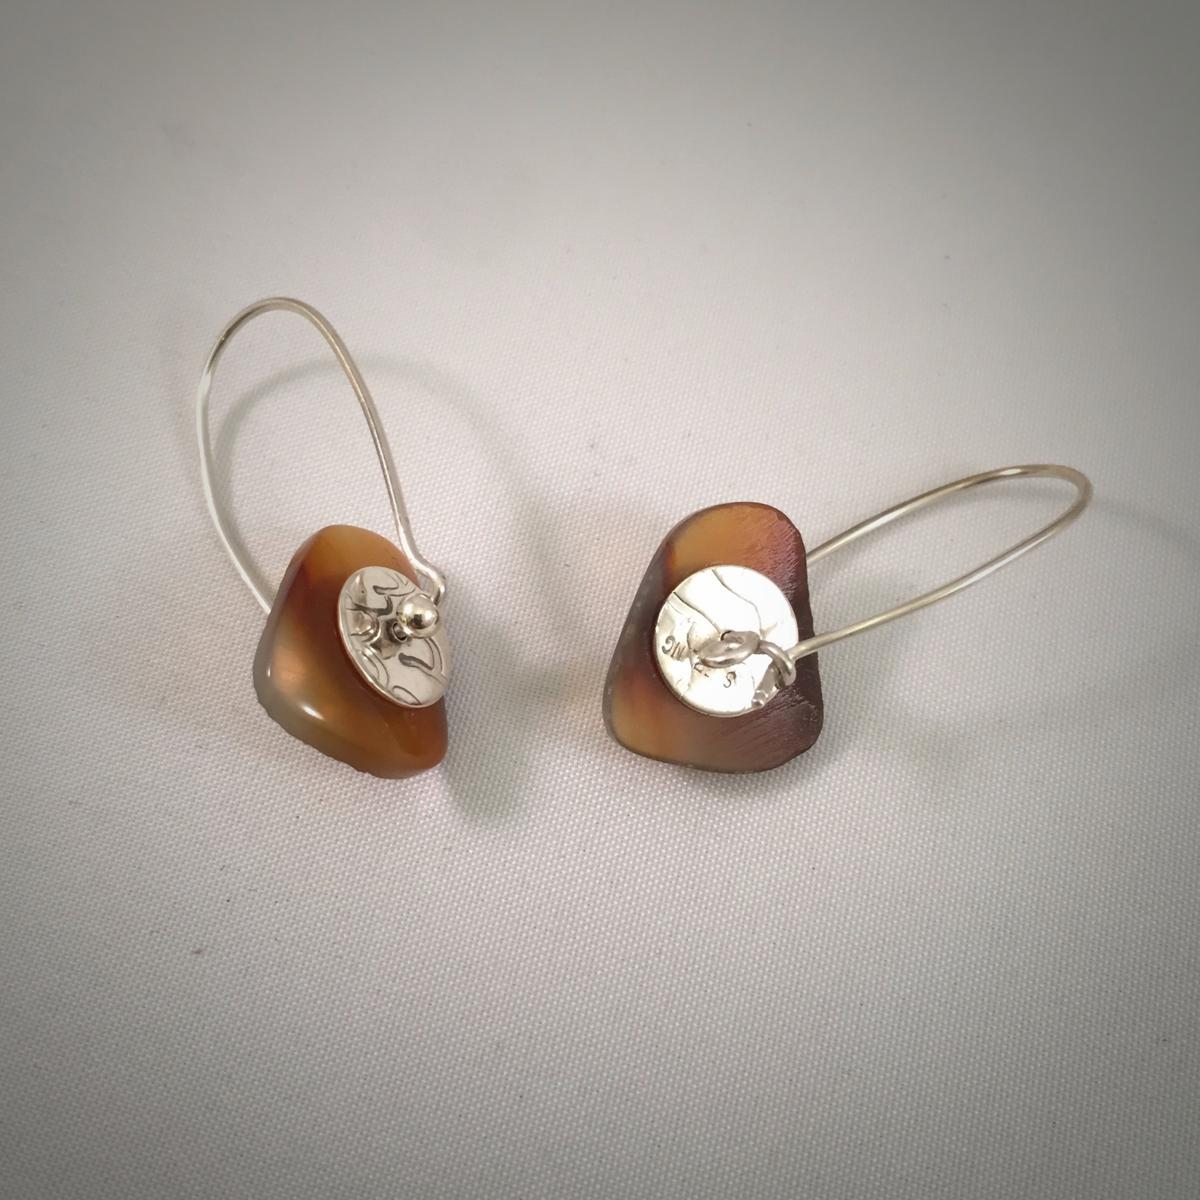 Stone Series Earrings#3 (large view)